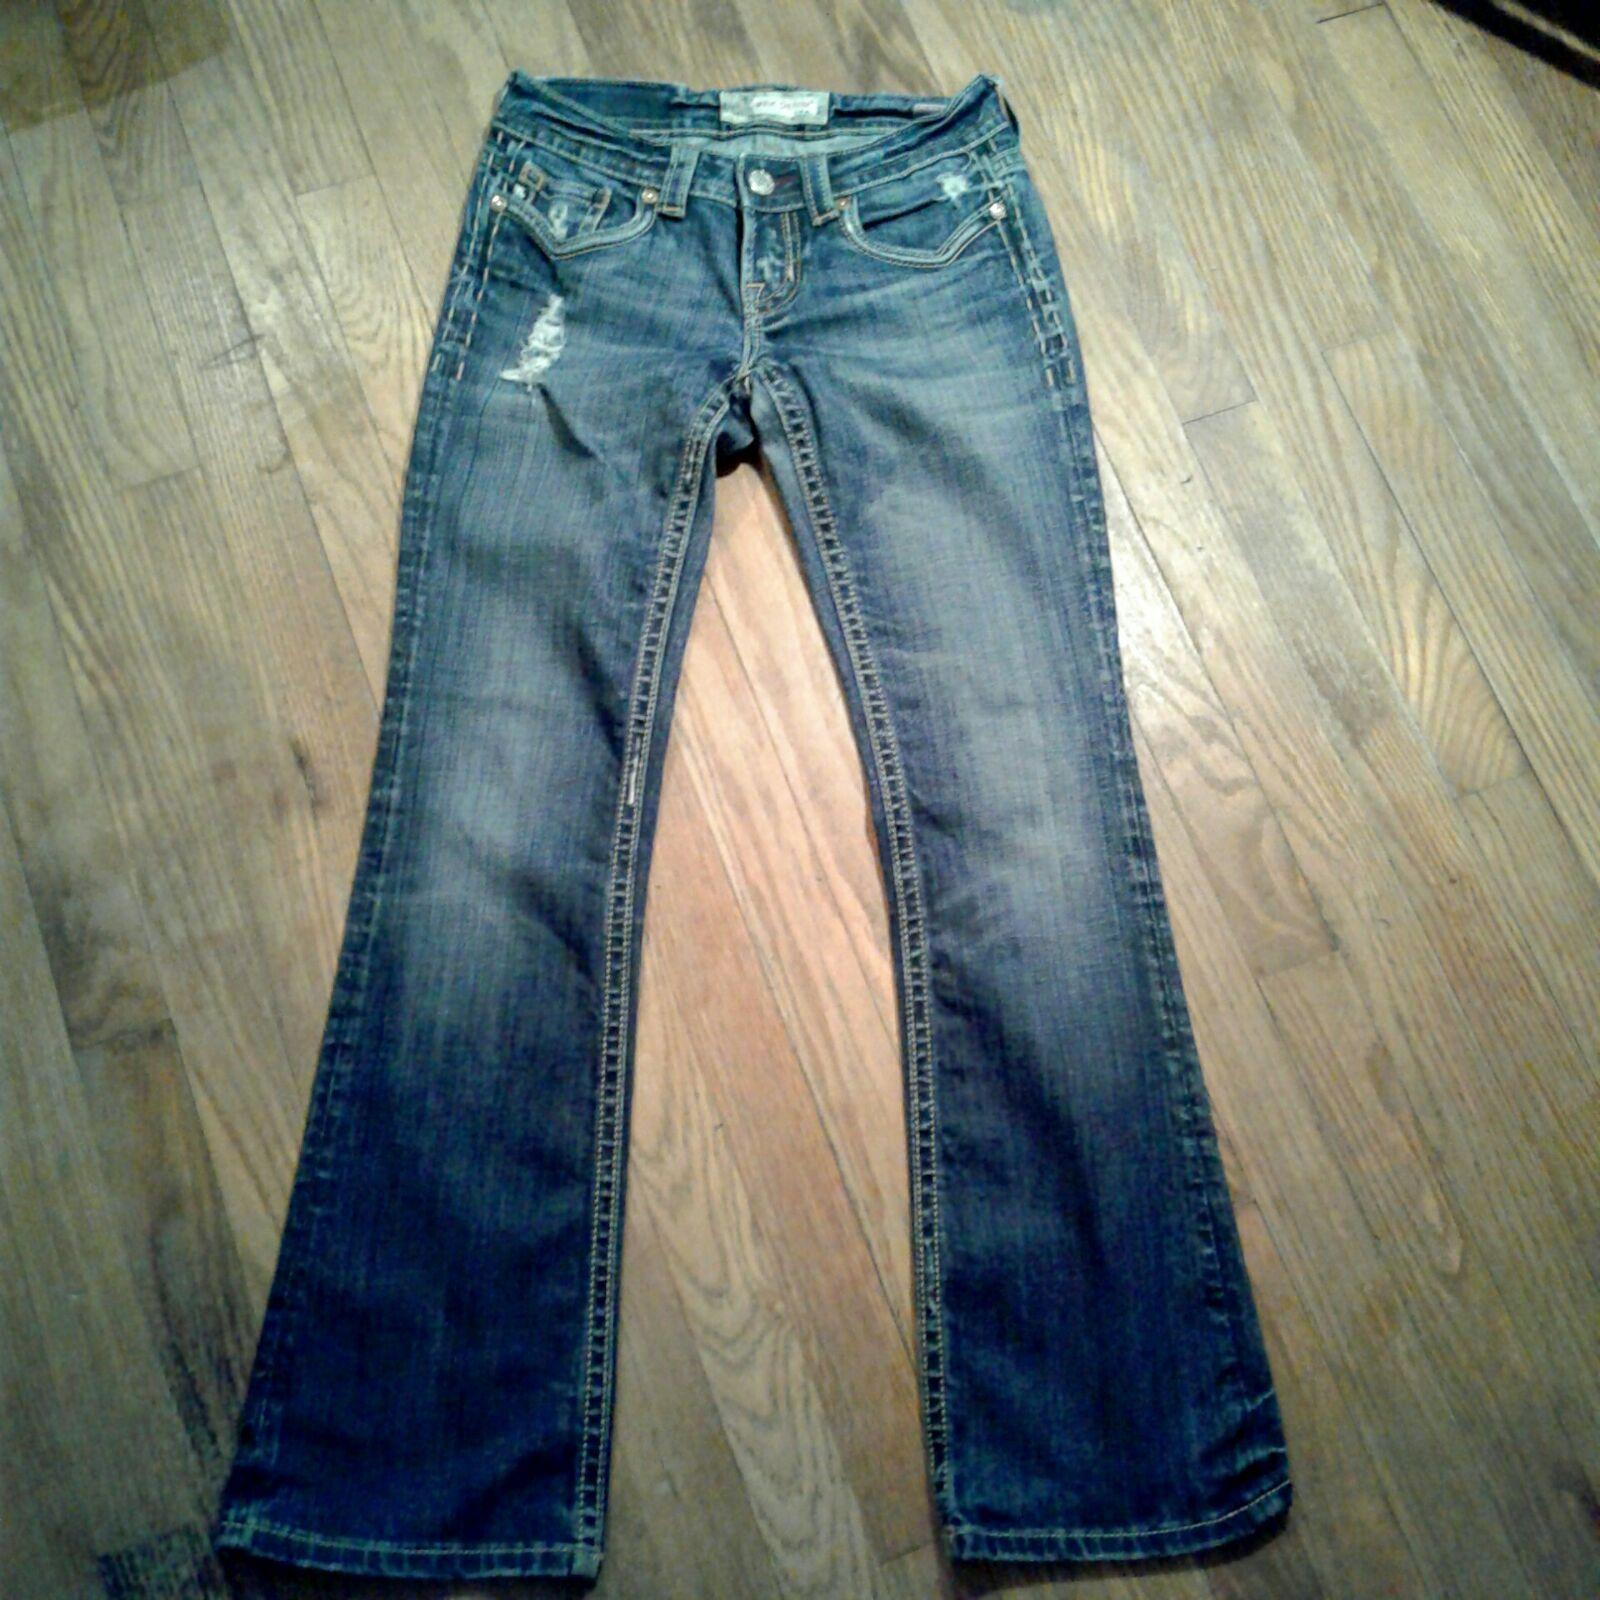 MEK jeans Kaikoura bootcut. 26x32